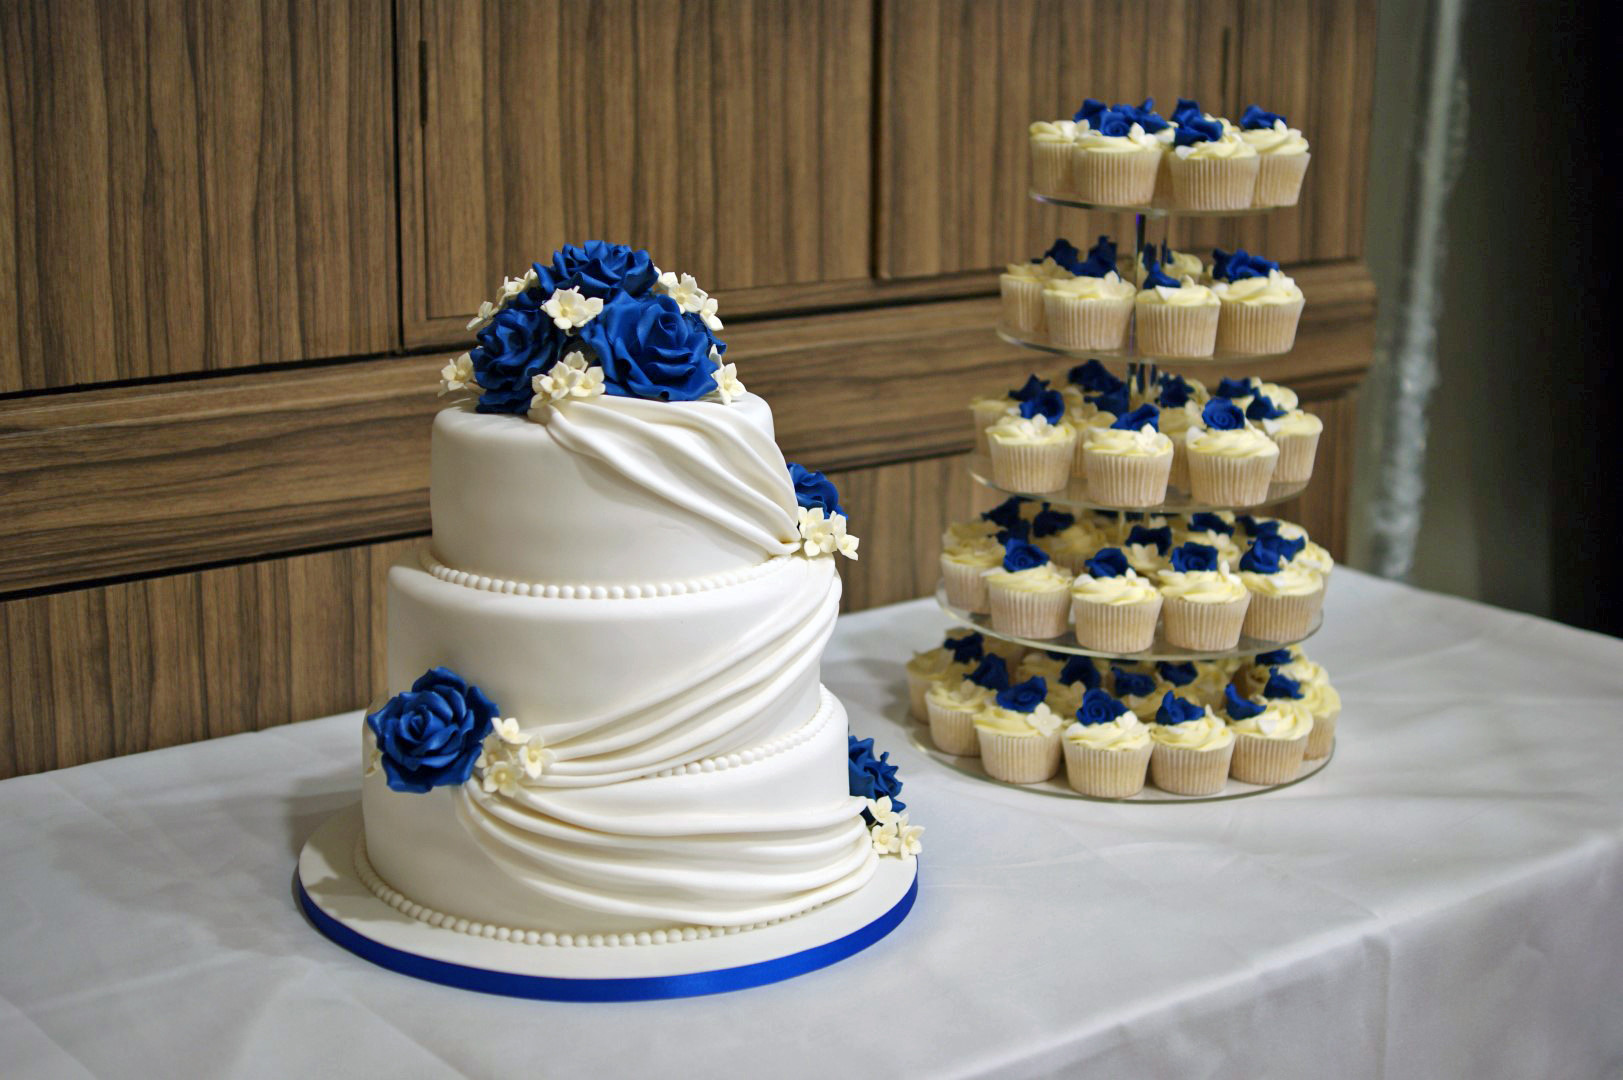 Wedding Cupcake Cakes  3 Tier Wedding Cake with Cupcake Tower Bakealous